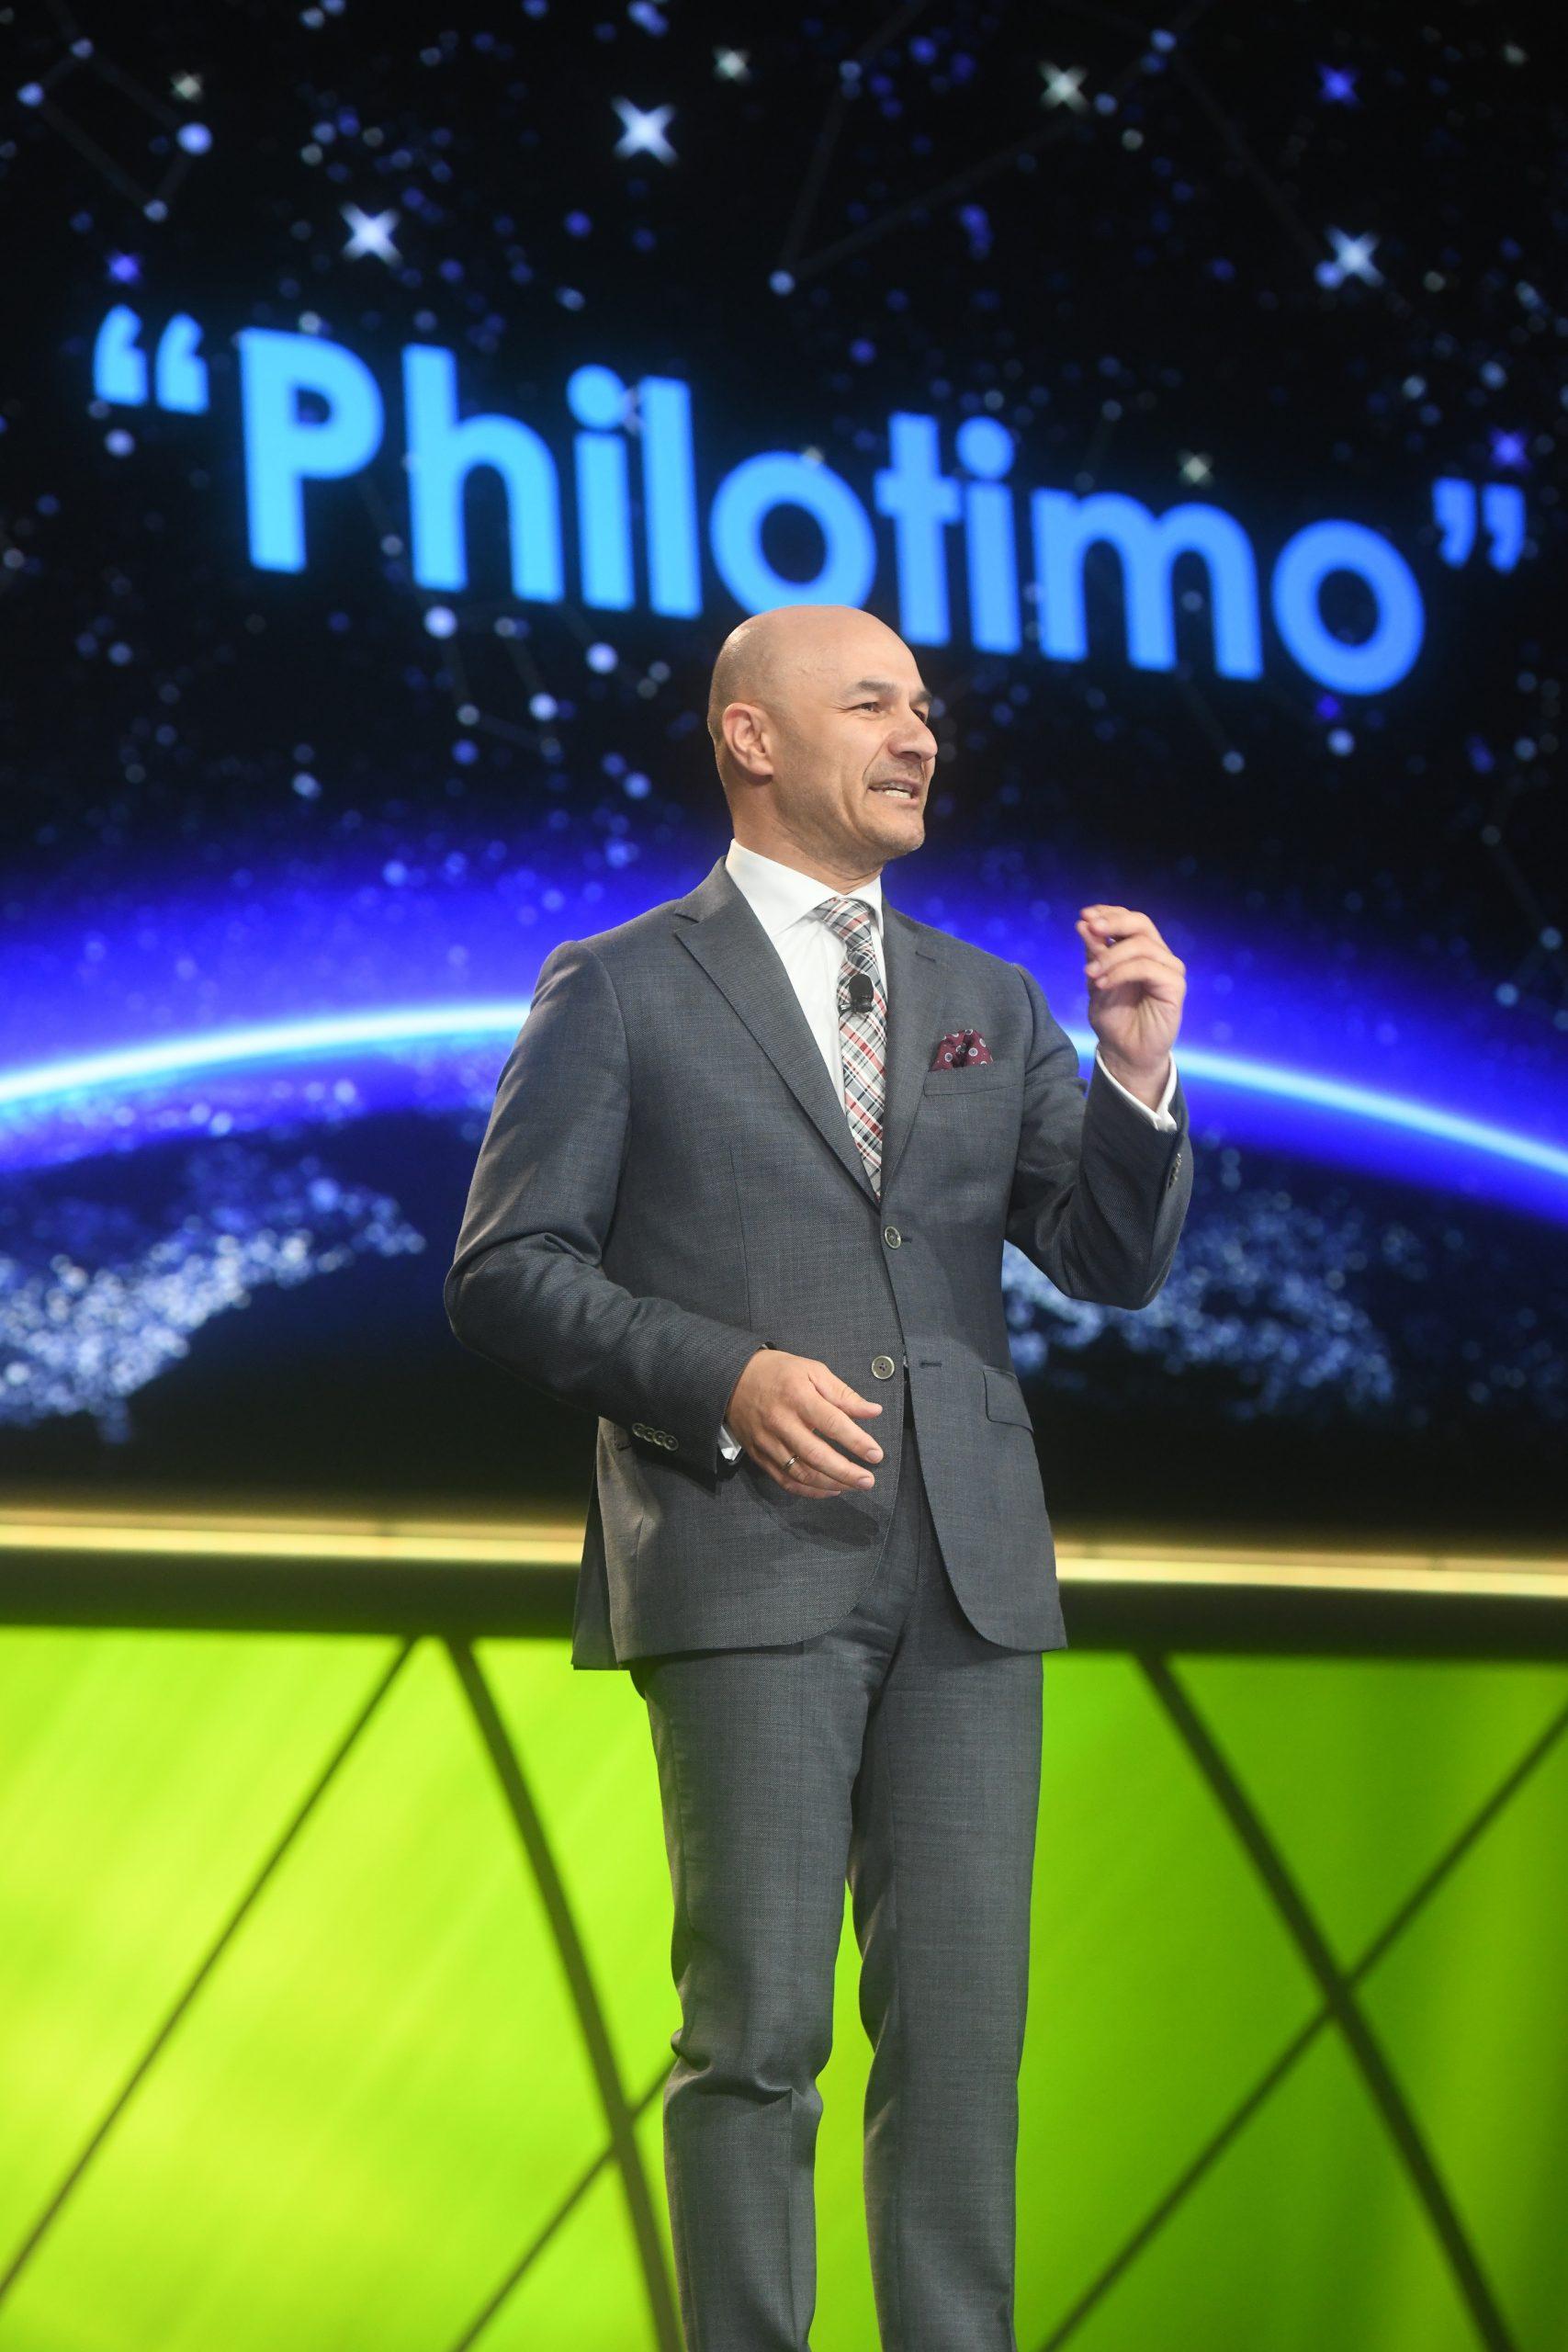 "MDRT Annual Meeting Miami 2019 Main Platform ""Philotimo"" Speech"